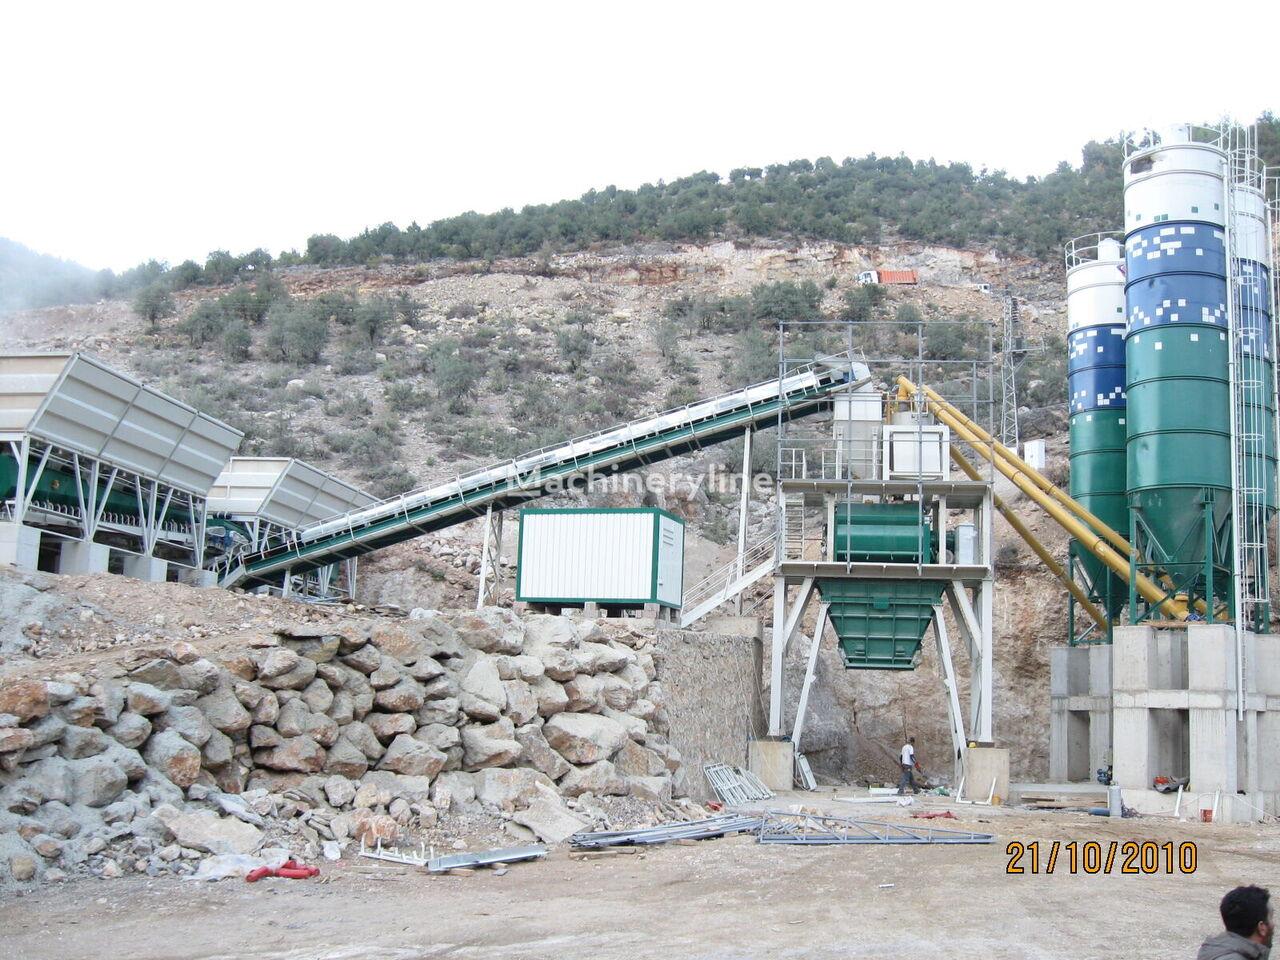 ny ASUR MAKİNA  STN 160 TWN betongfabrikk